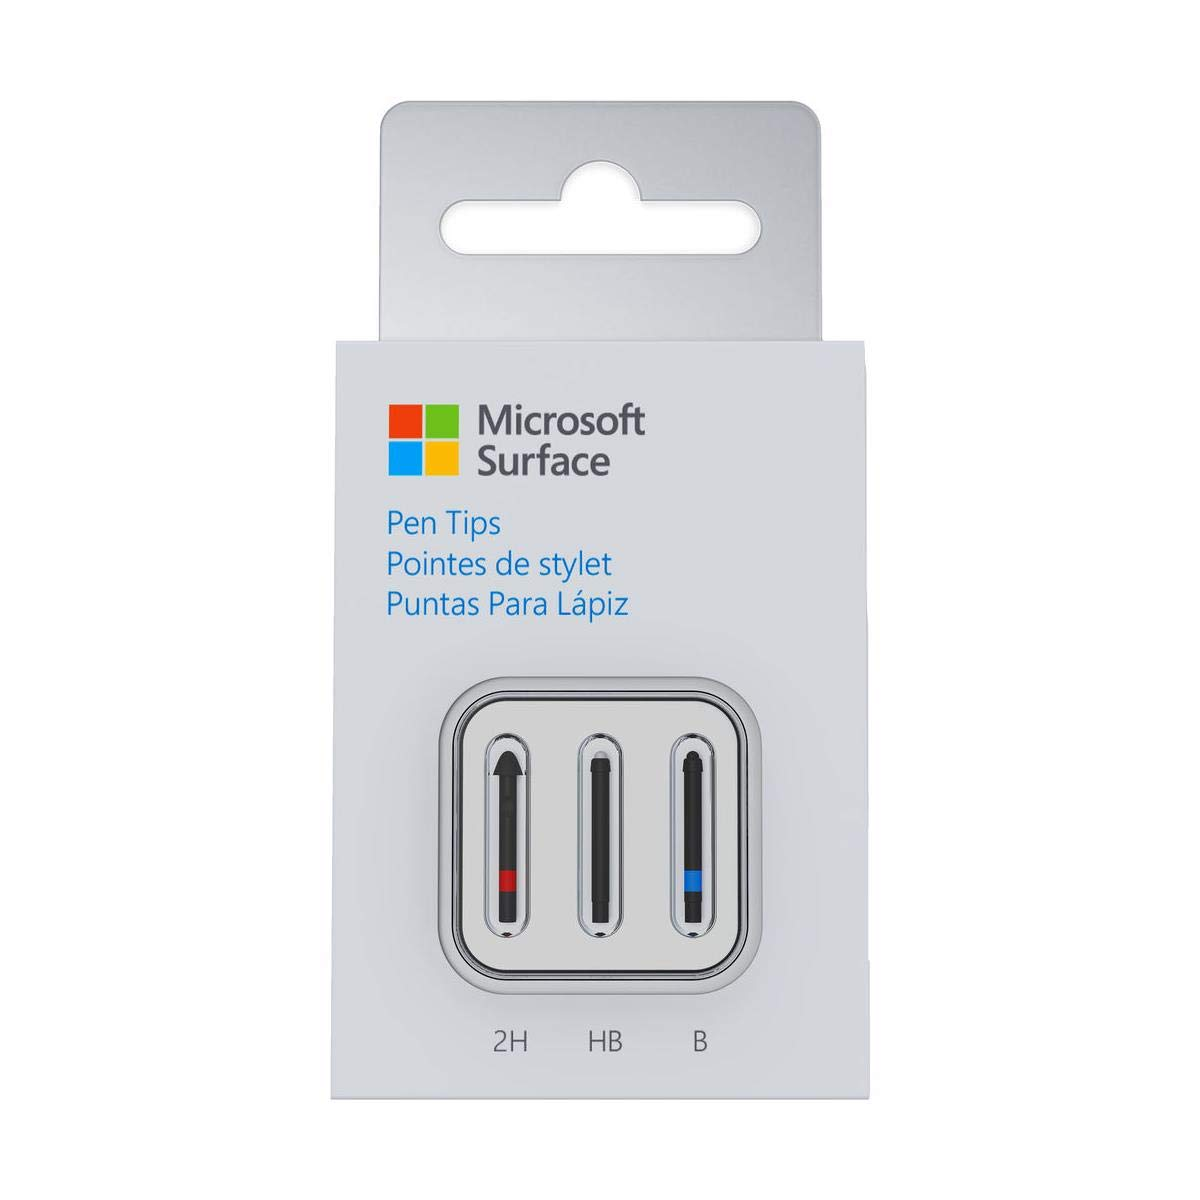 Microsoft Surface Pen Tips